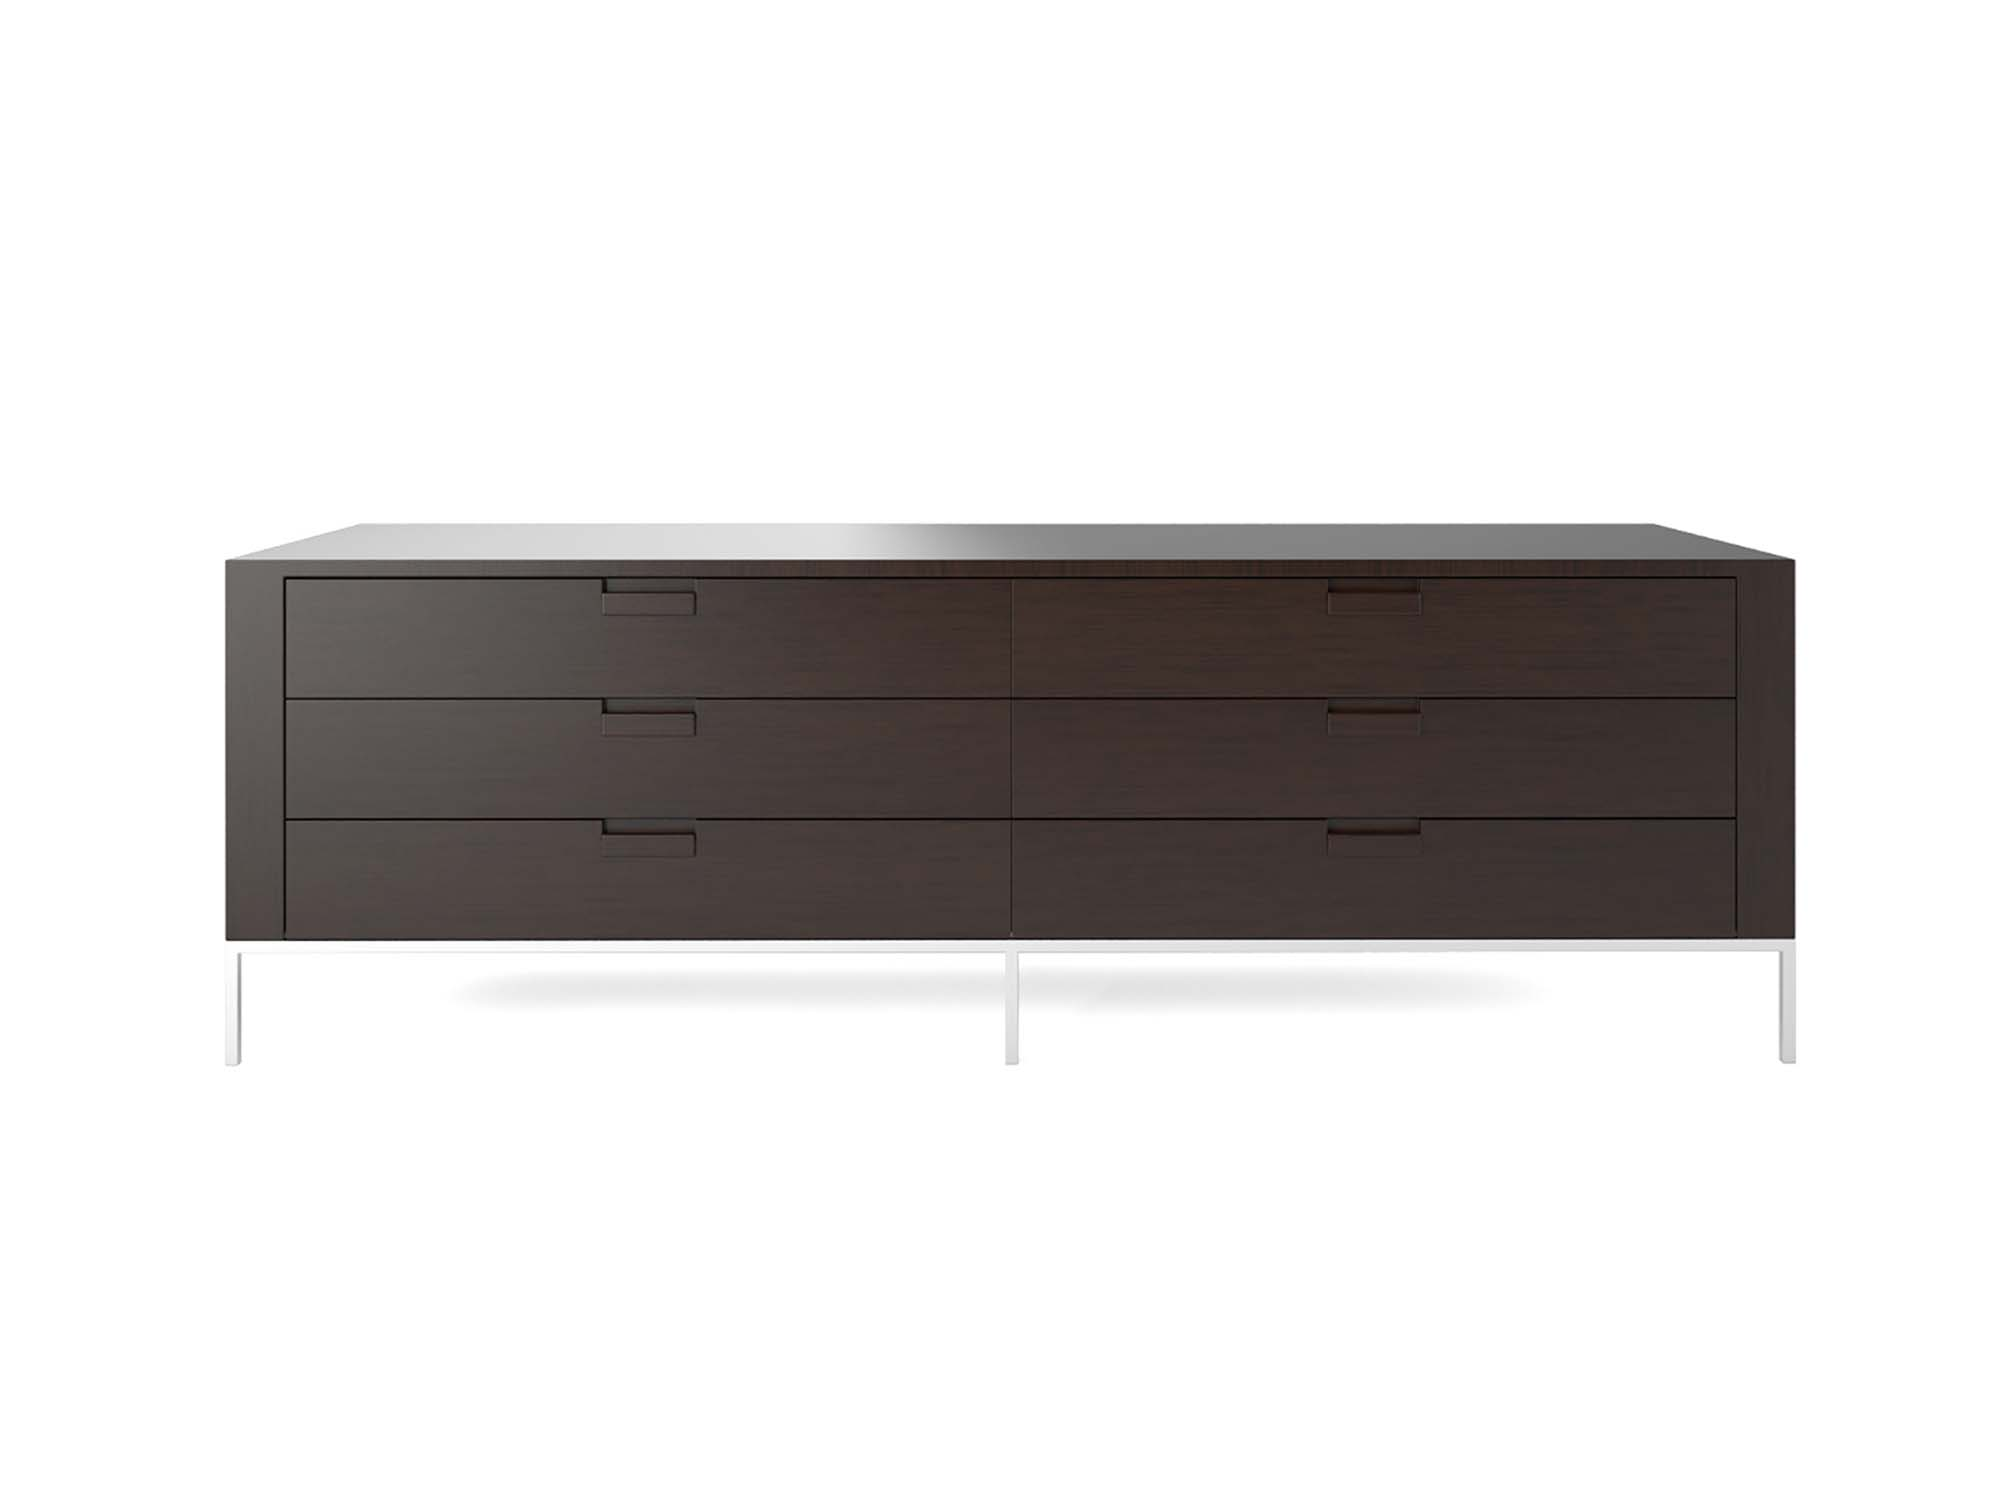 Titanes Sideboard Wooden Cabinet 3D Model